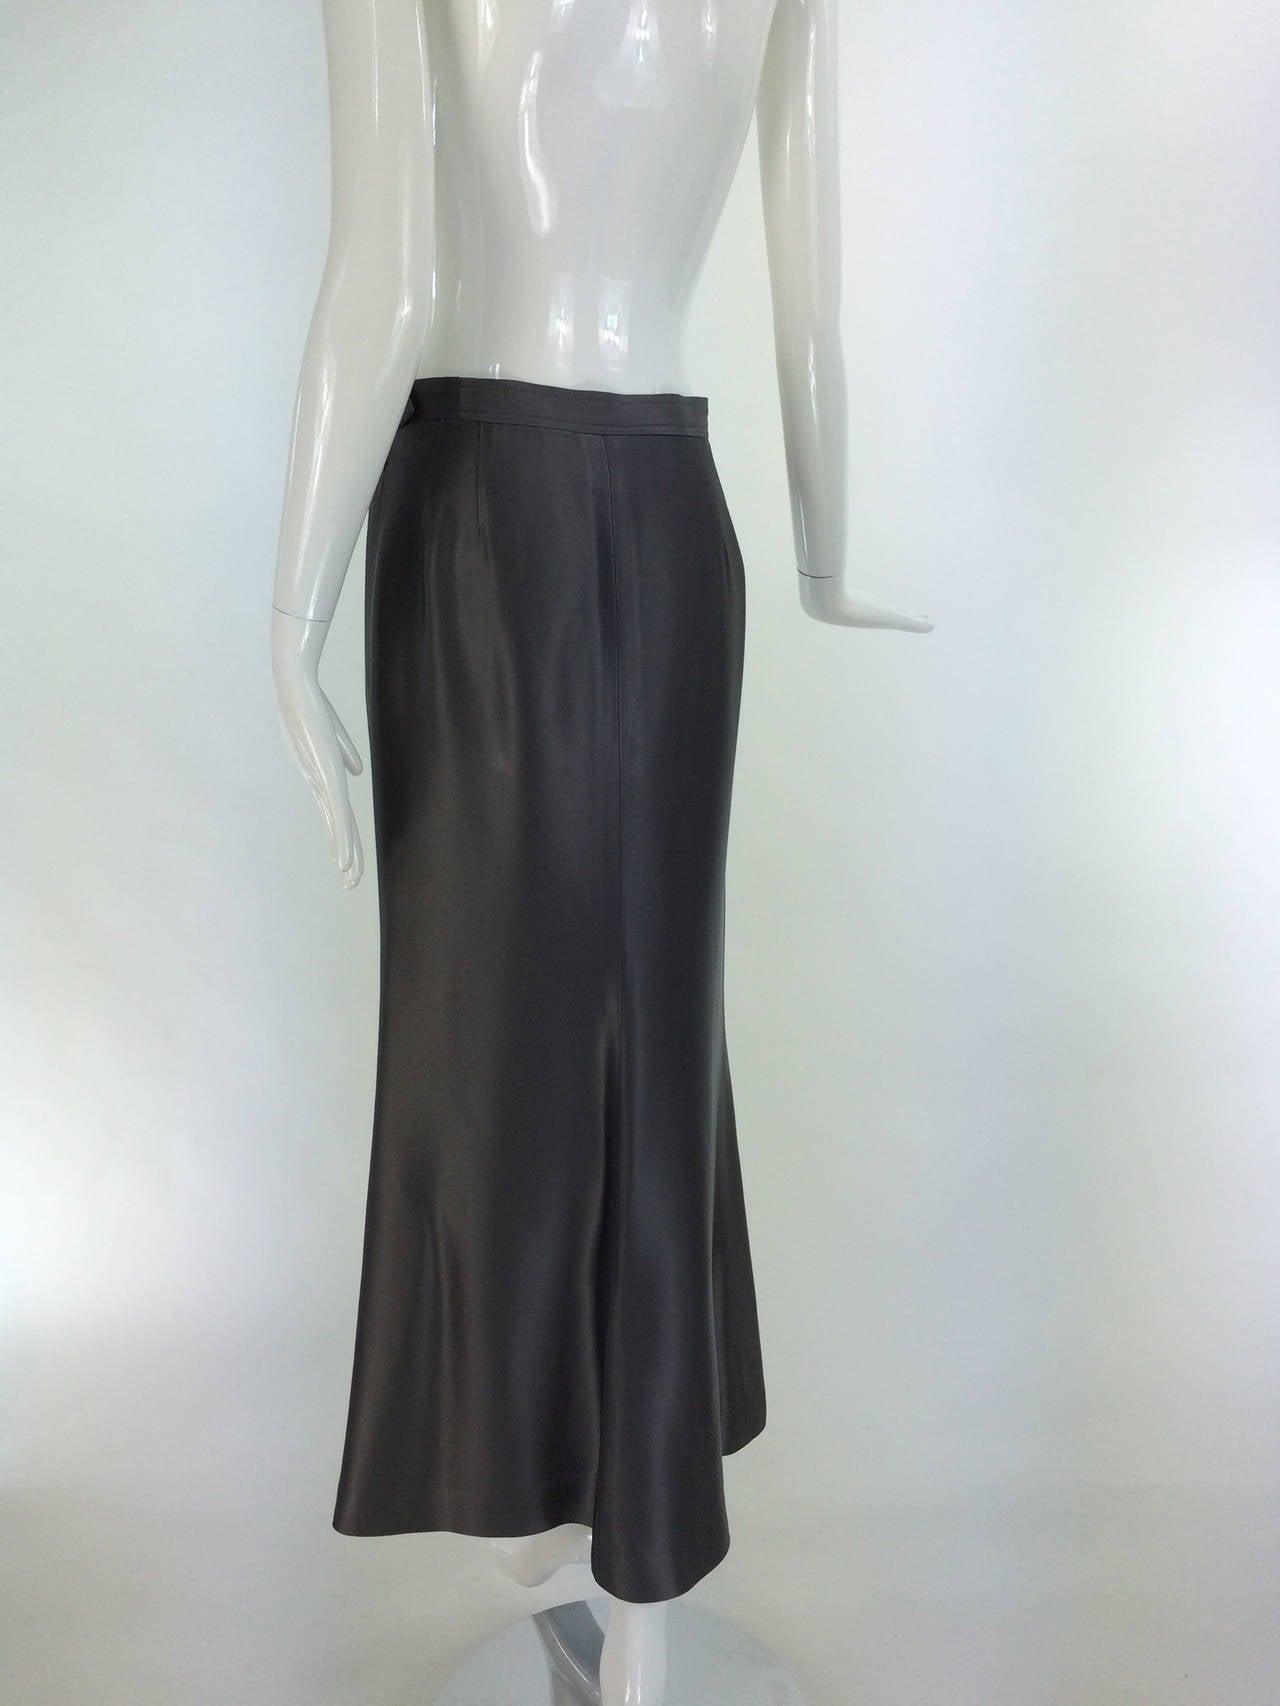 Yves St Laurent Rive Gauche silver grey satin evening skirt 1990s 6